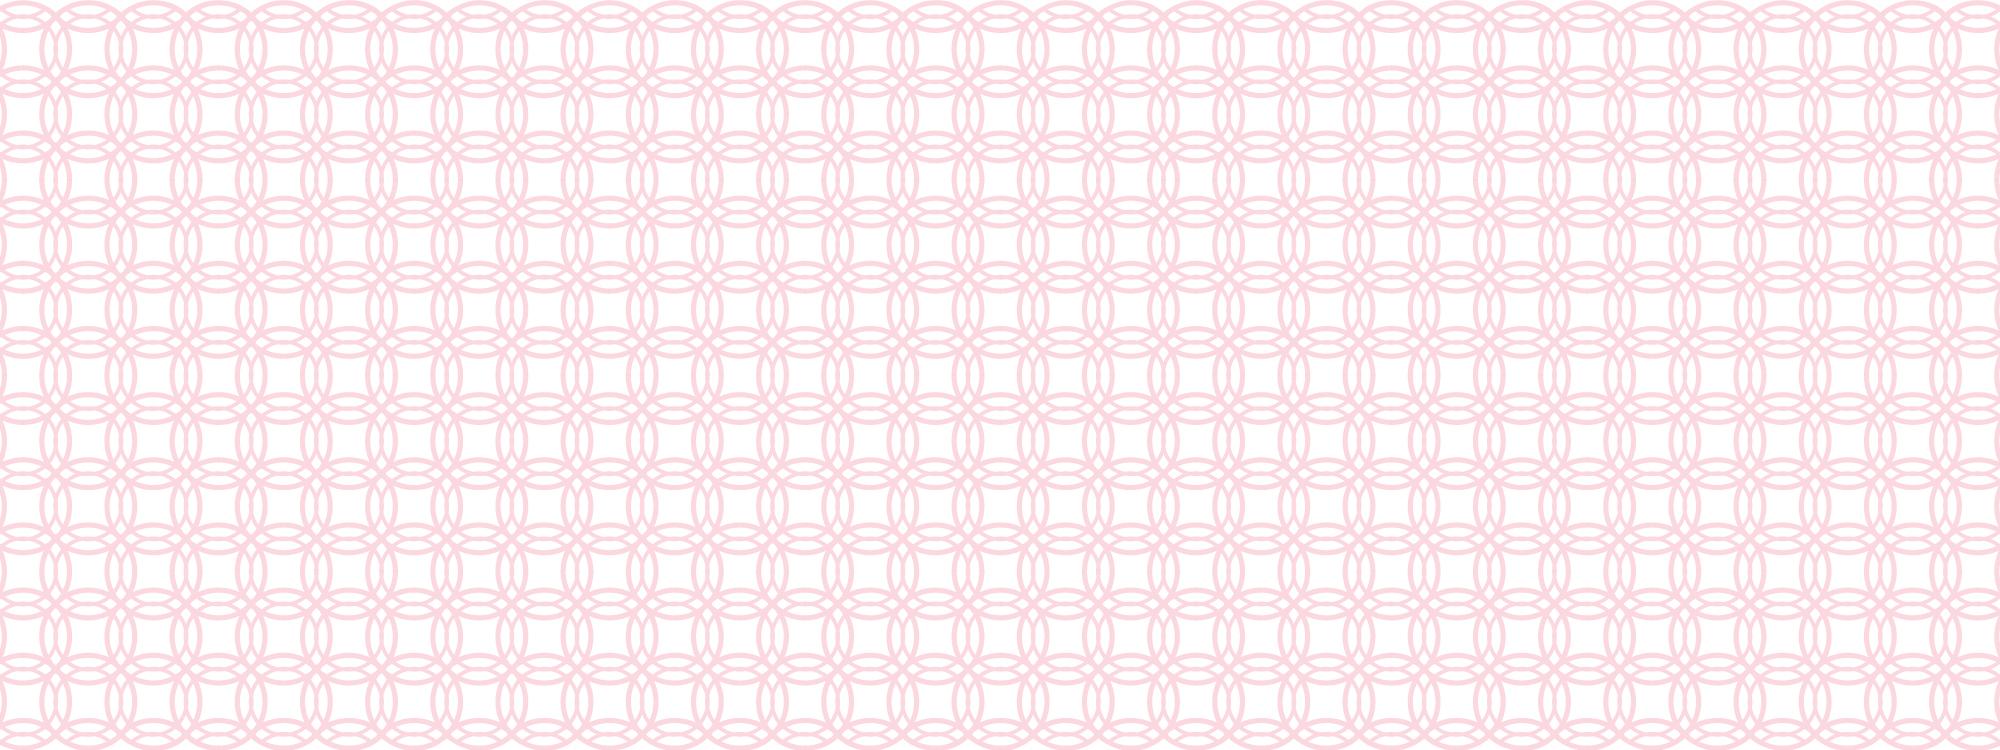 muah_pattern